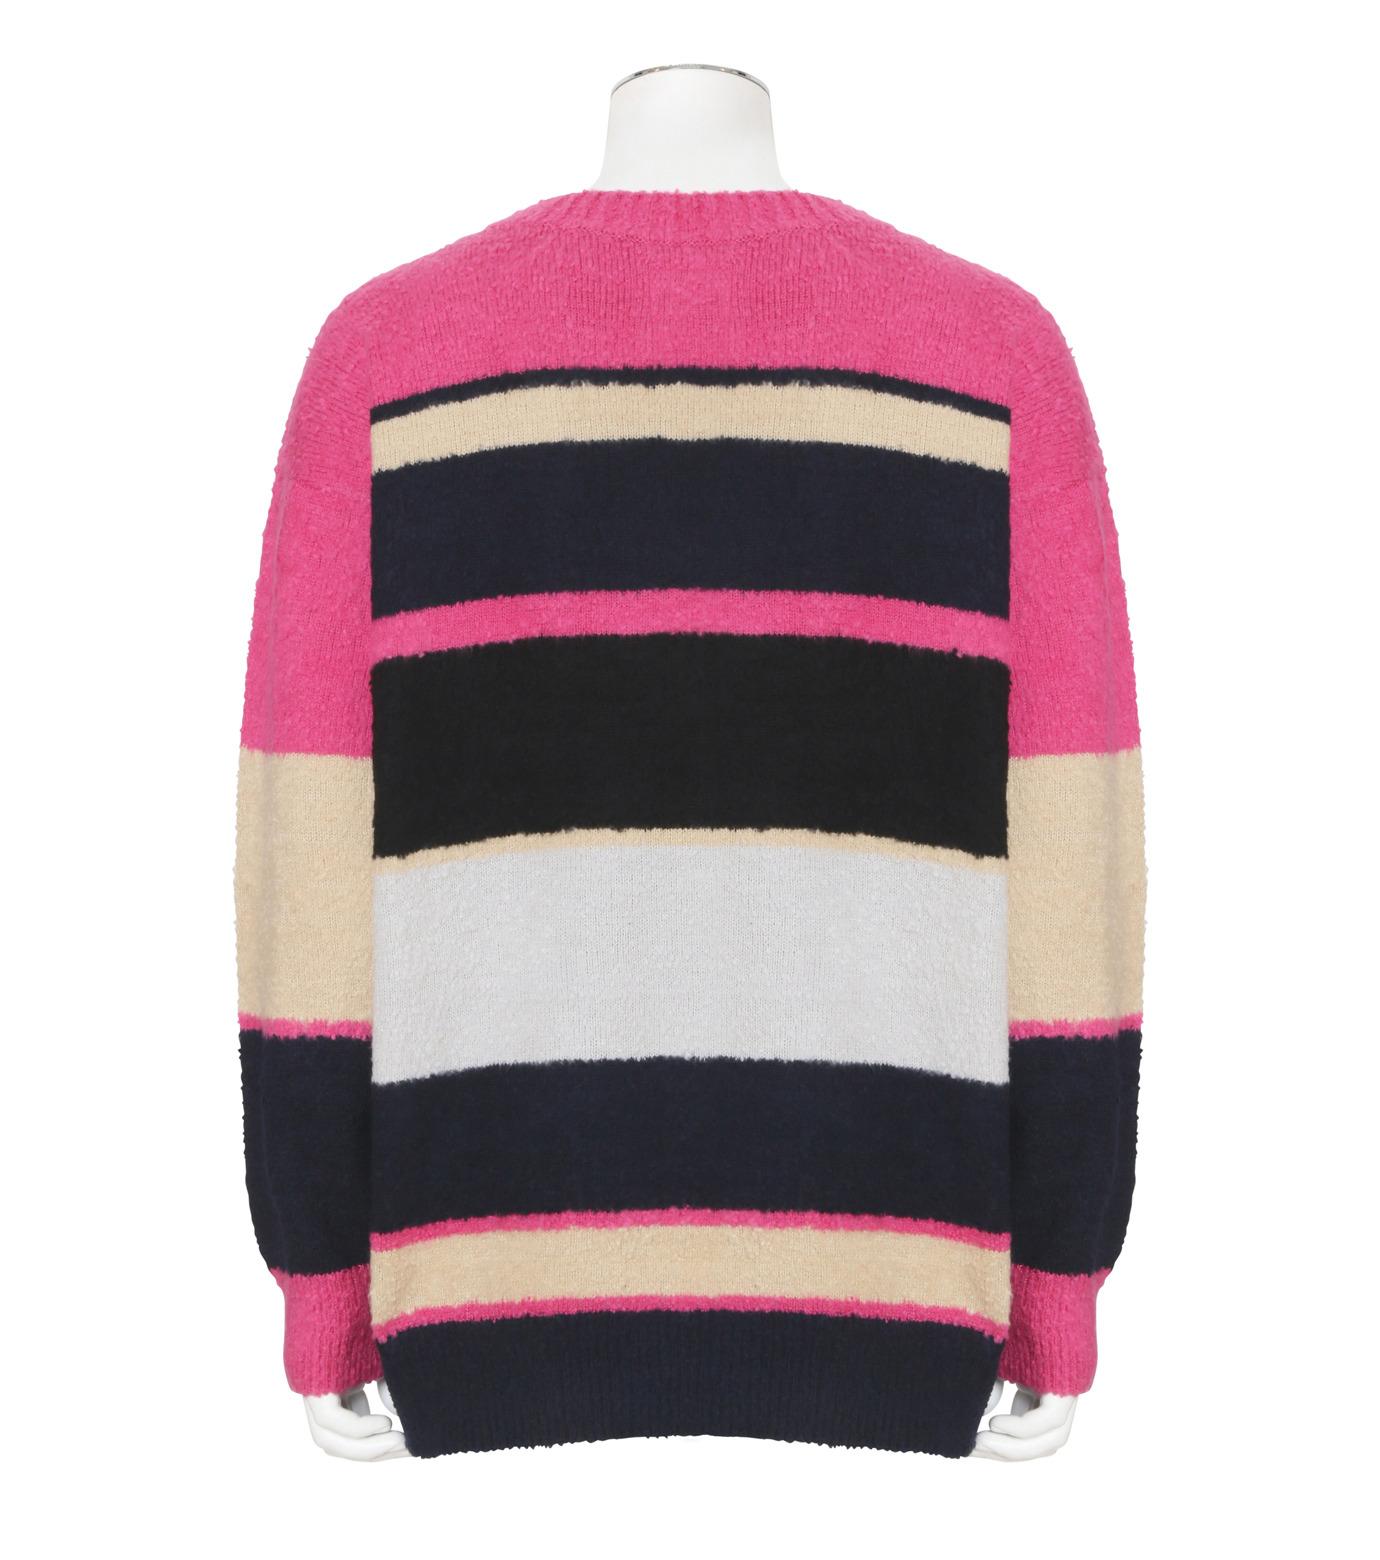 Sacai(サカイ)のPattern Knit-PINK(ニット/knit)-17-01217M-72 拡大詳細画像2